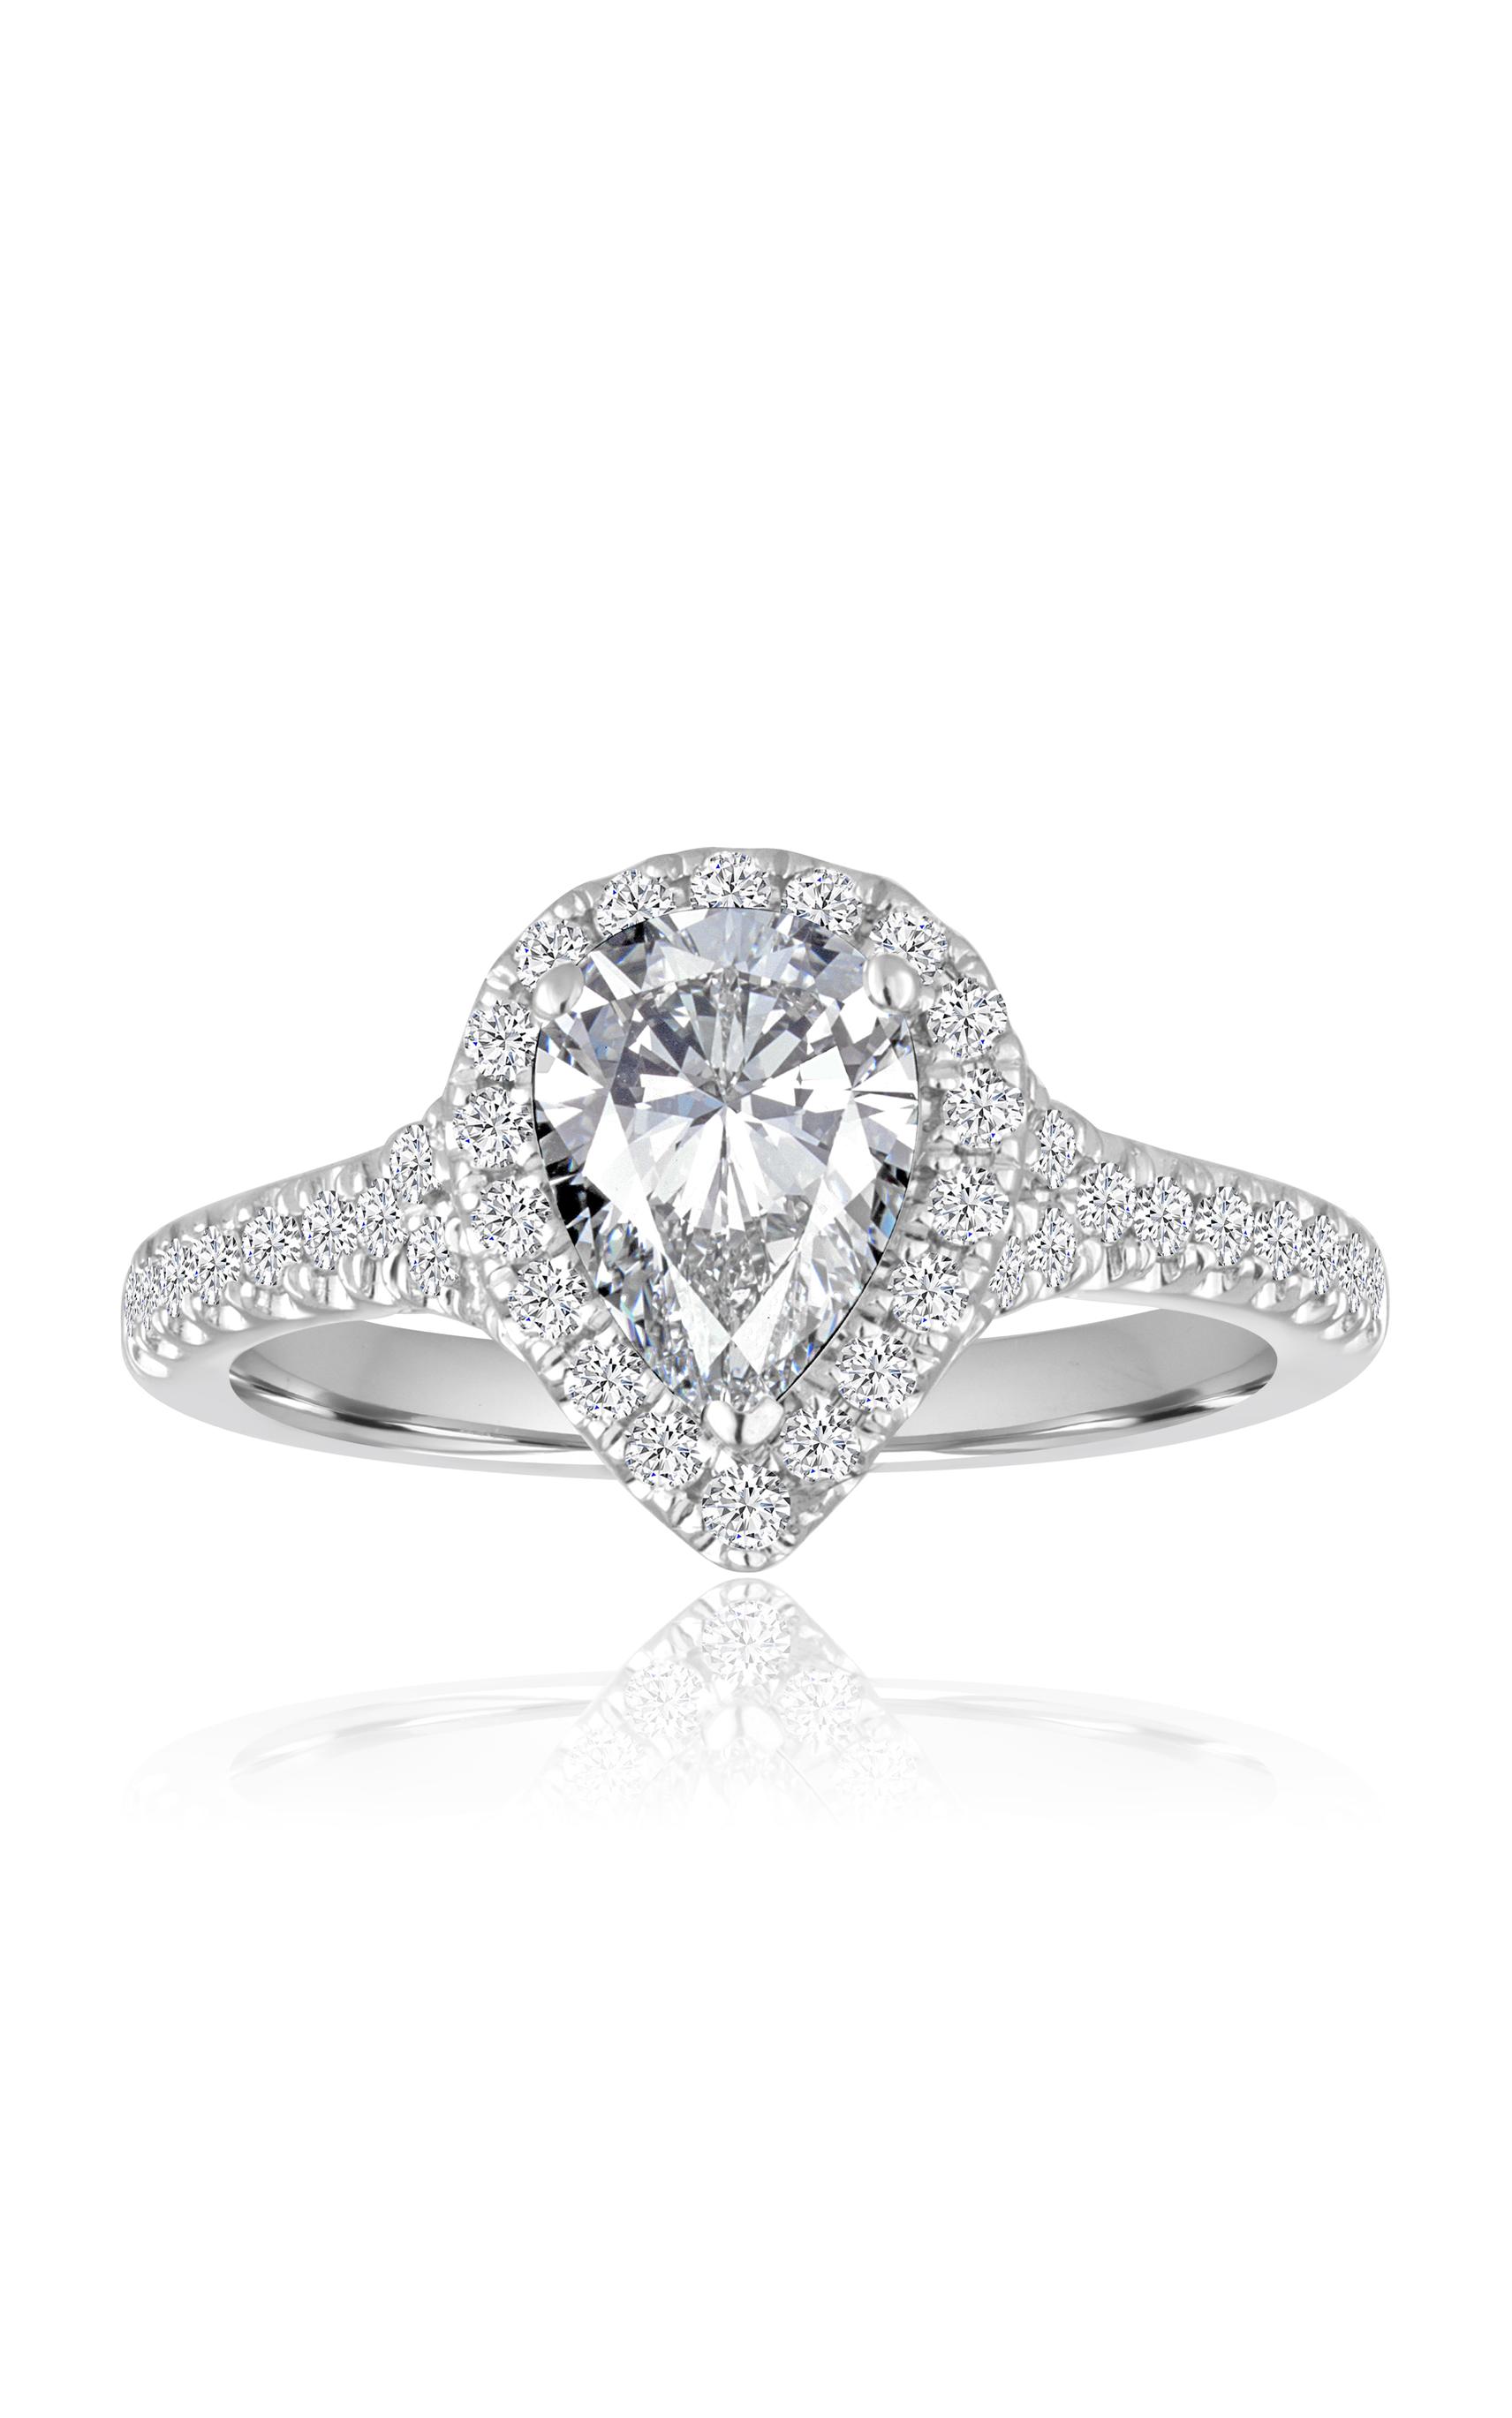 Imagine Bridal Engagement Rings 63216D-1 5 product image